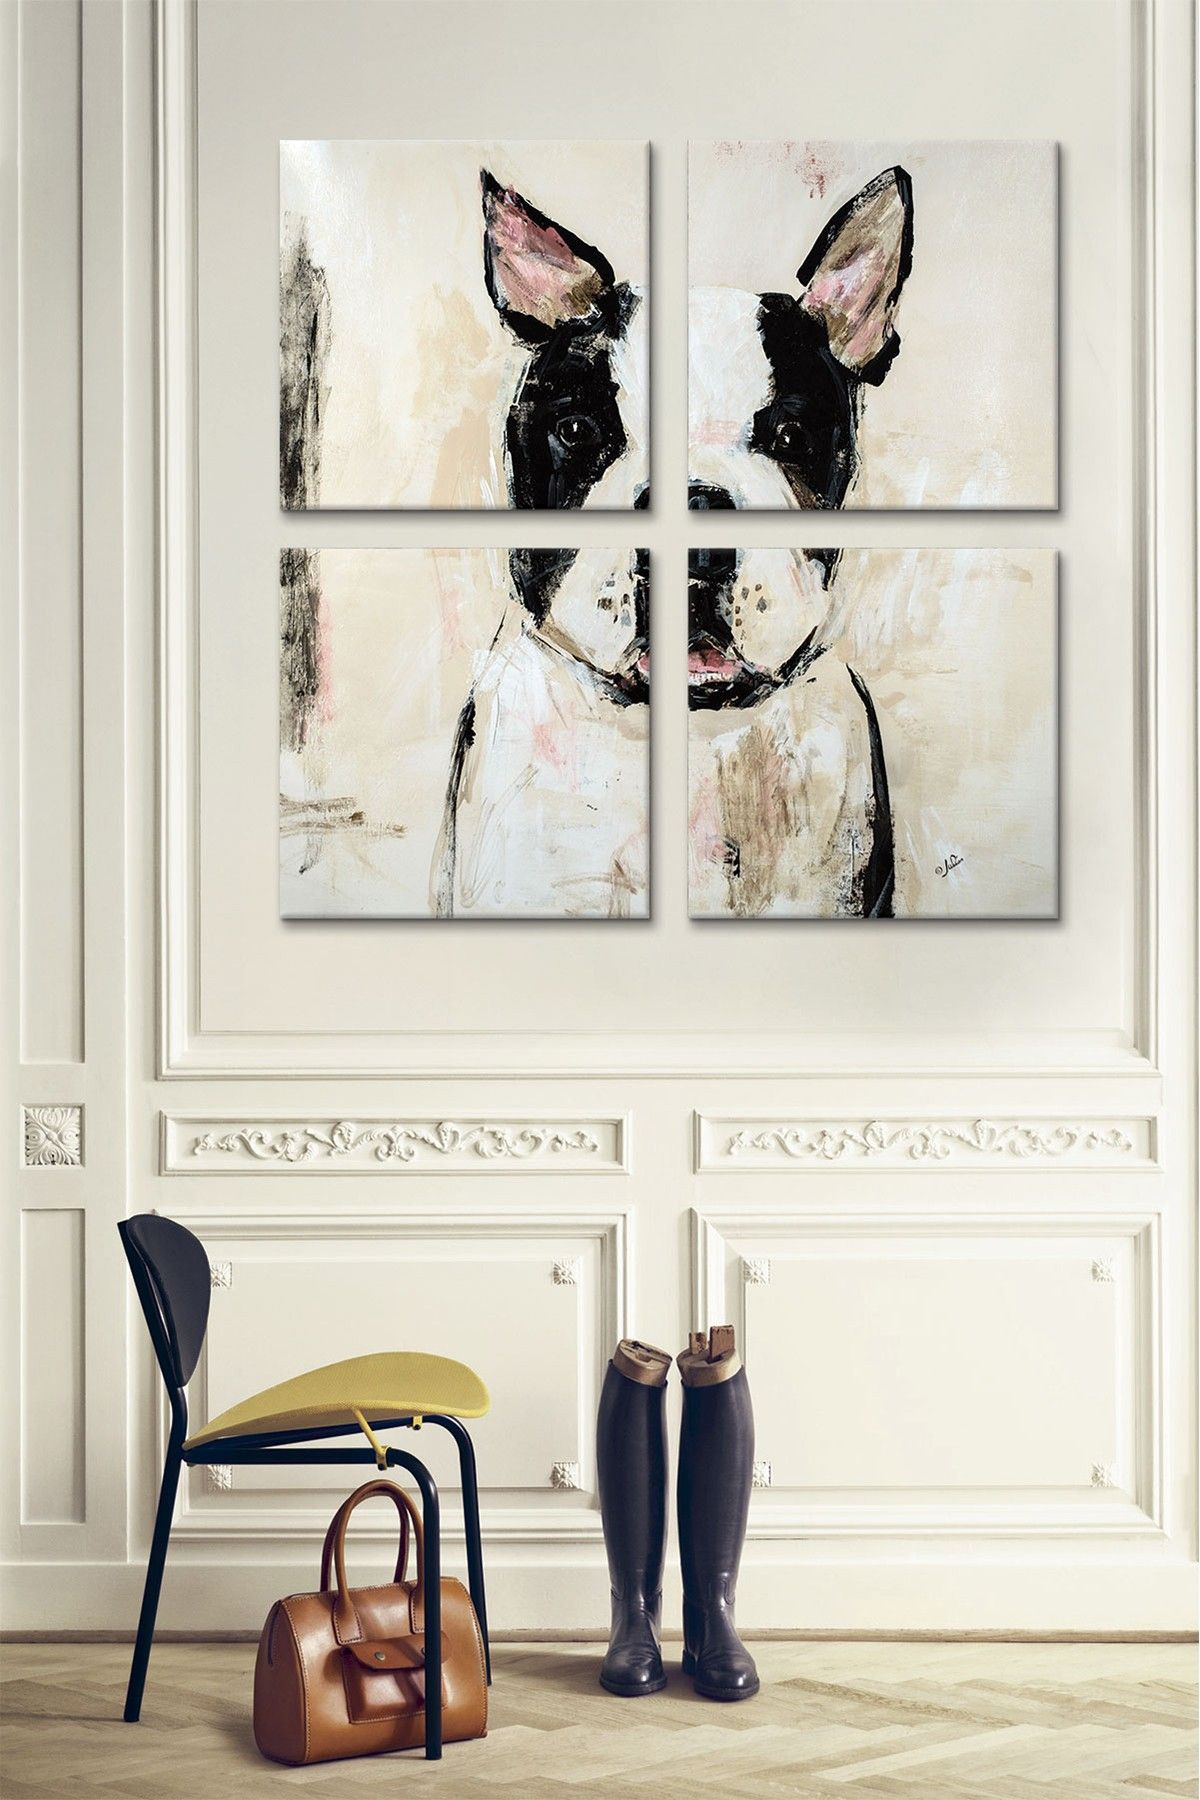 Cuadro / pintura / perro / dog picture / decoración / decor / Mediterranean Natural